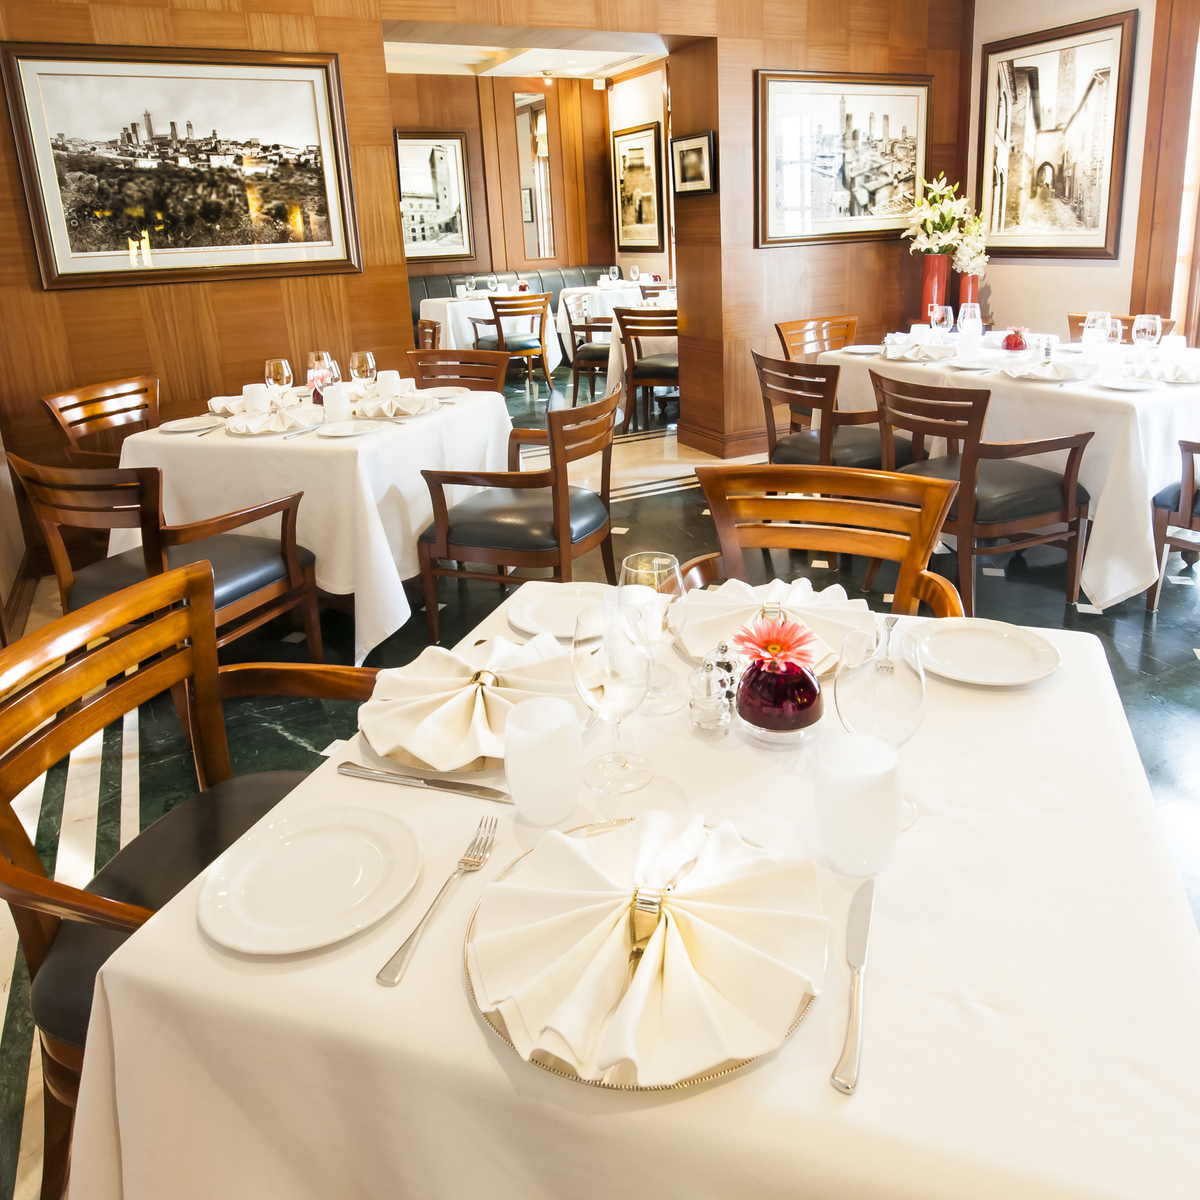 Italian Restaurant, Imperial Hotel, New Delhi